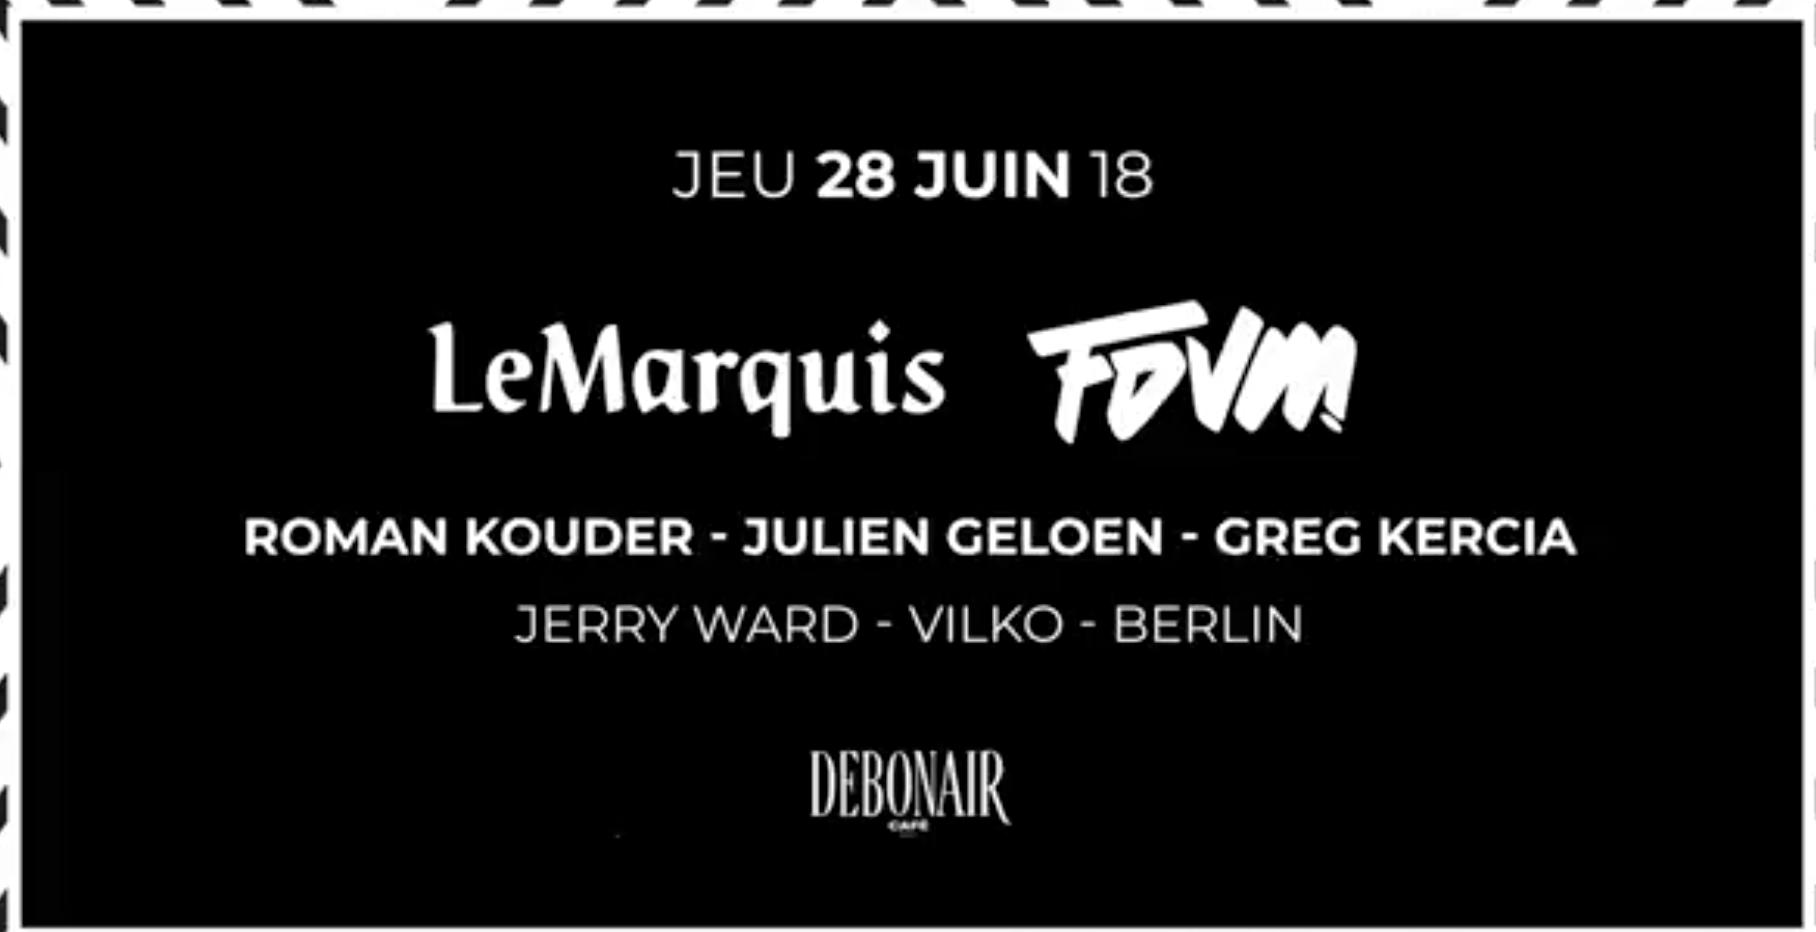 Midnight invite LeMarquis&FDVM